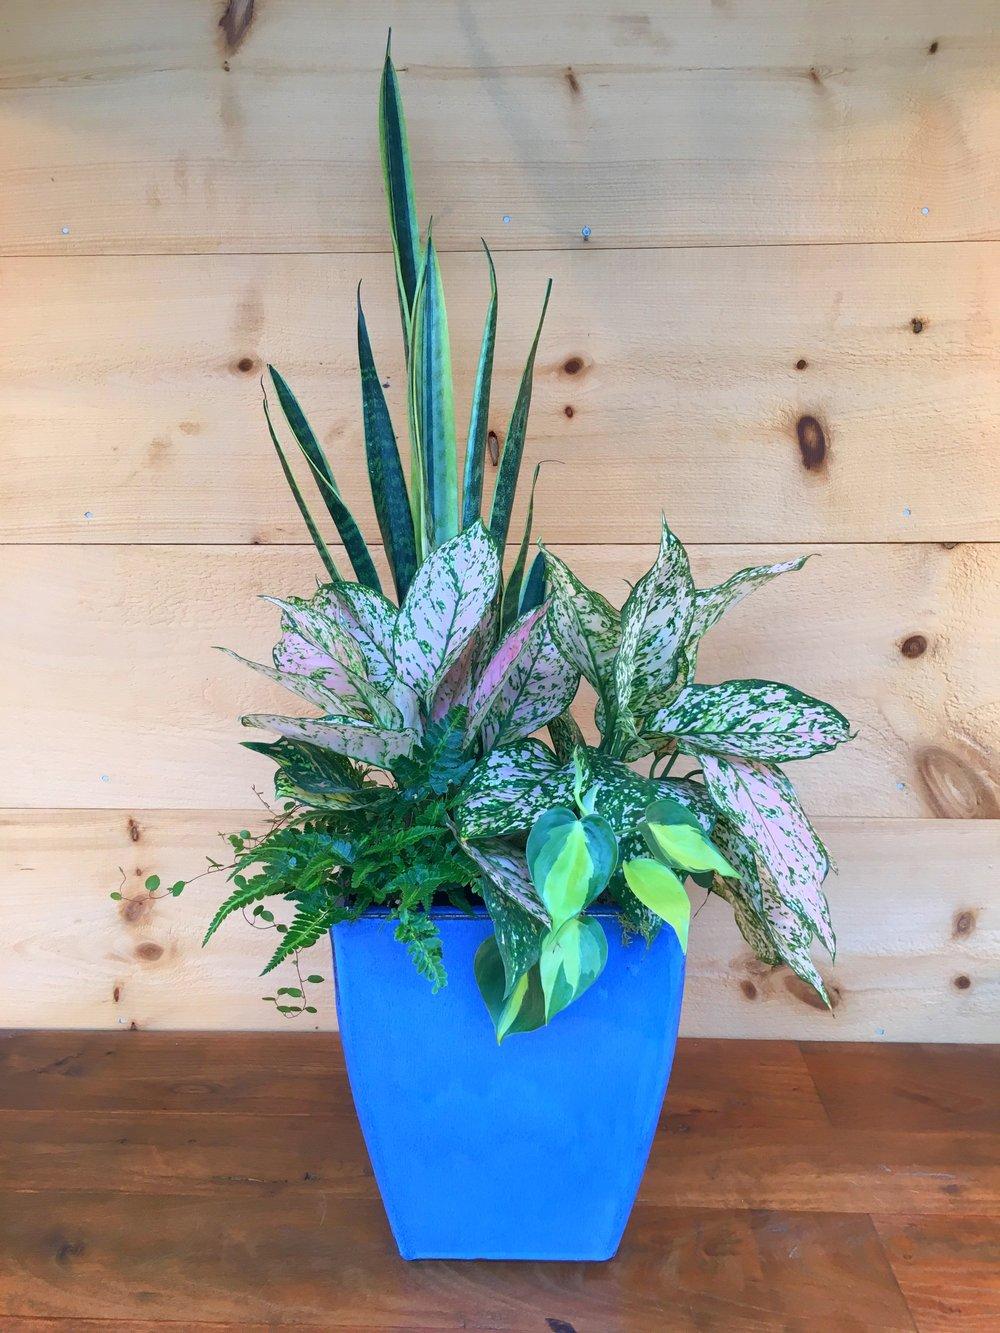 shadehouseplantswebsite.jpg